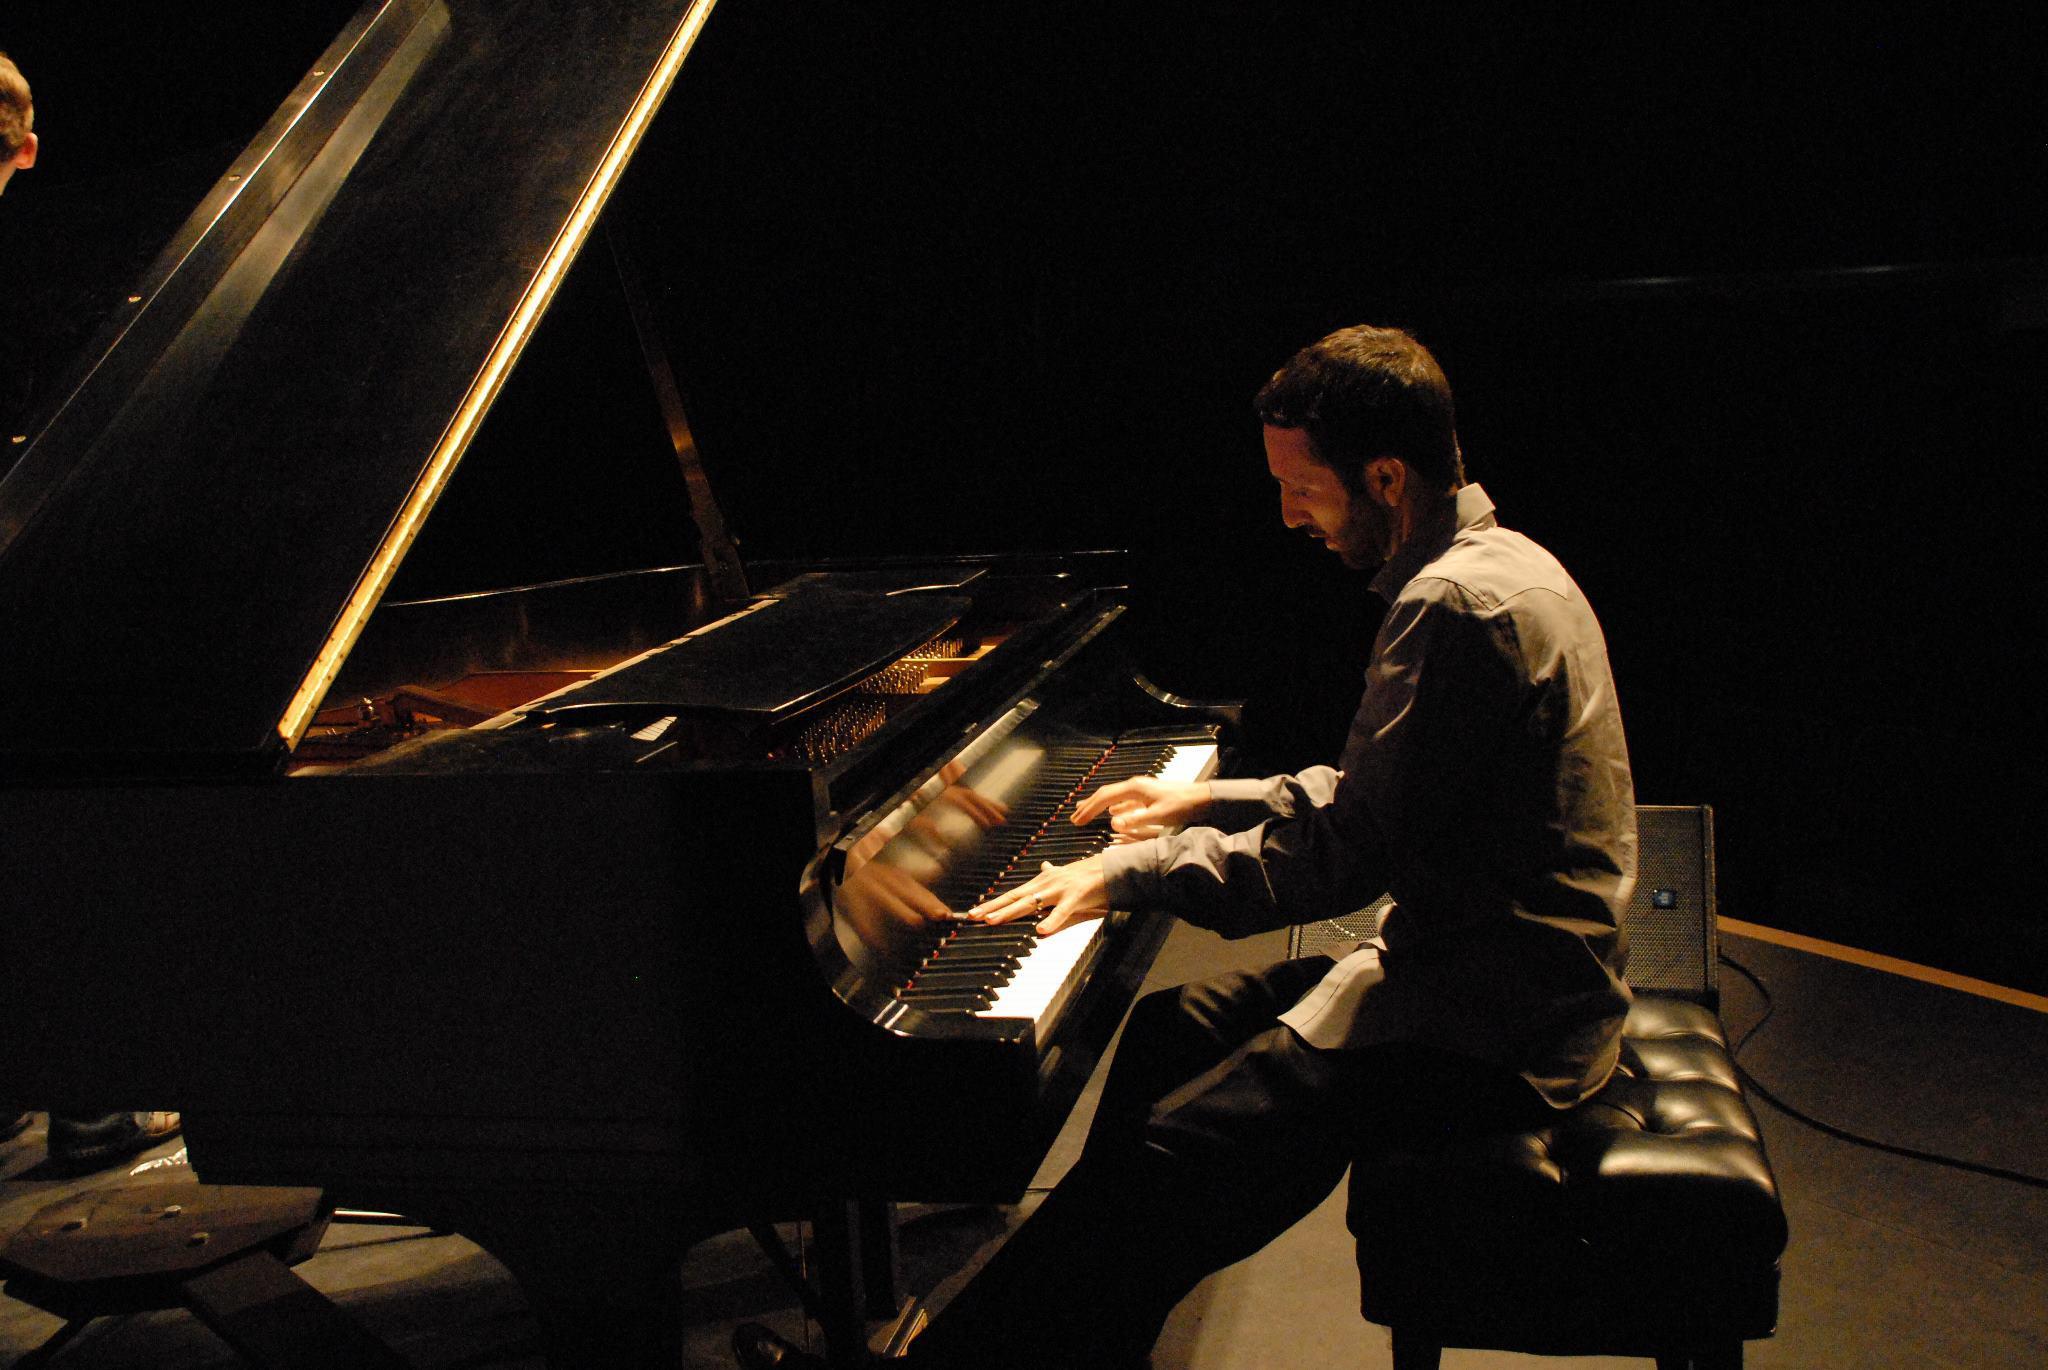 danny-green-piano-01.jpg